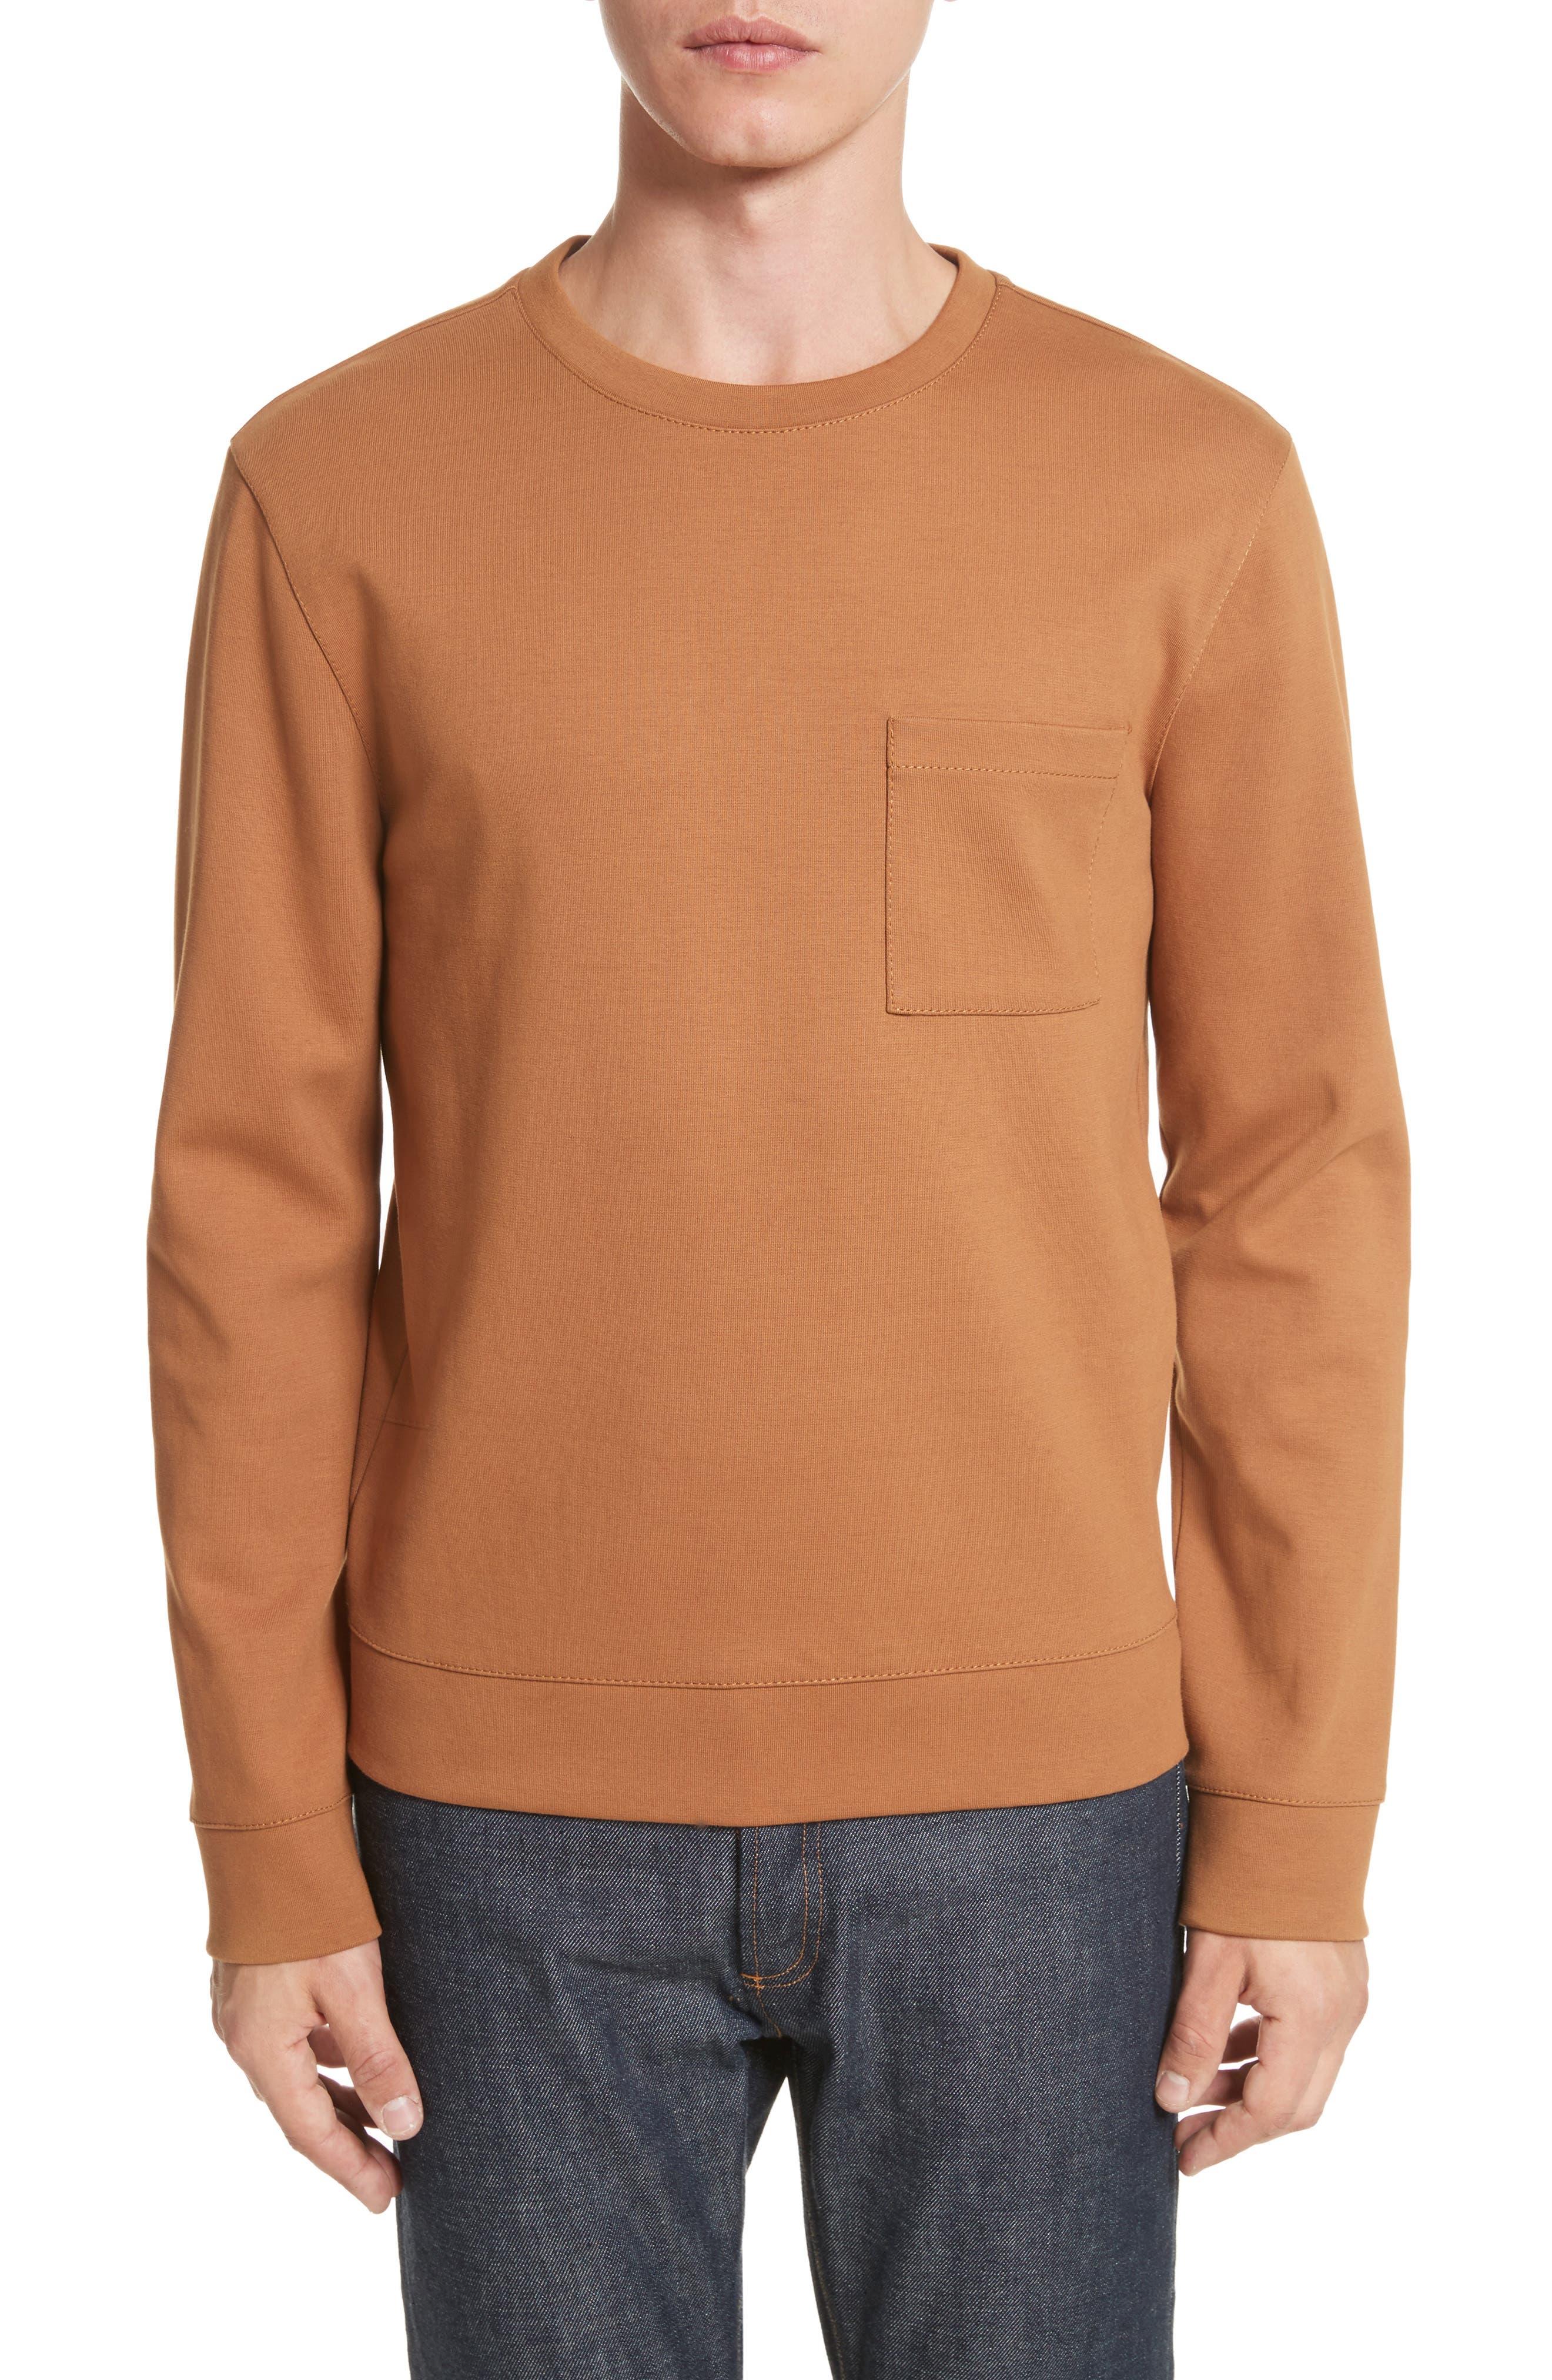 Yogi Sweatshirt,                         Main,                         color, 243